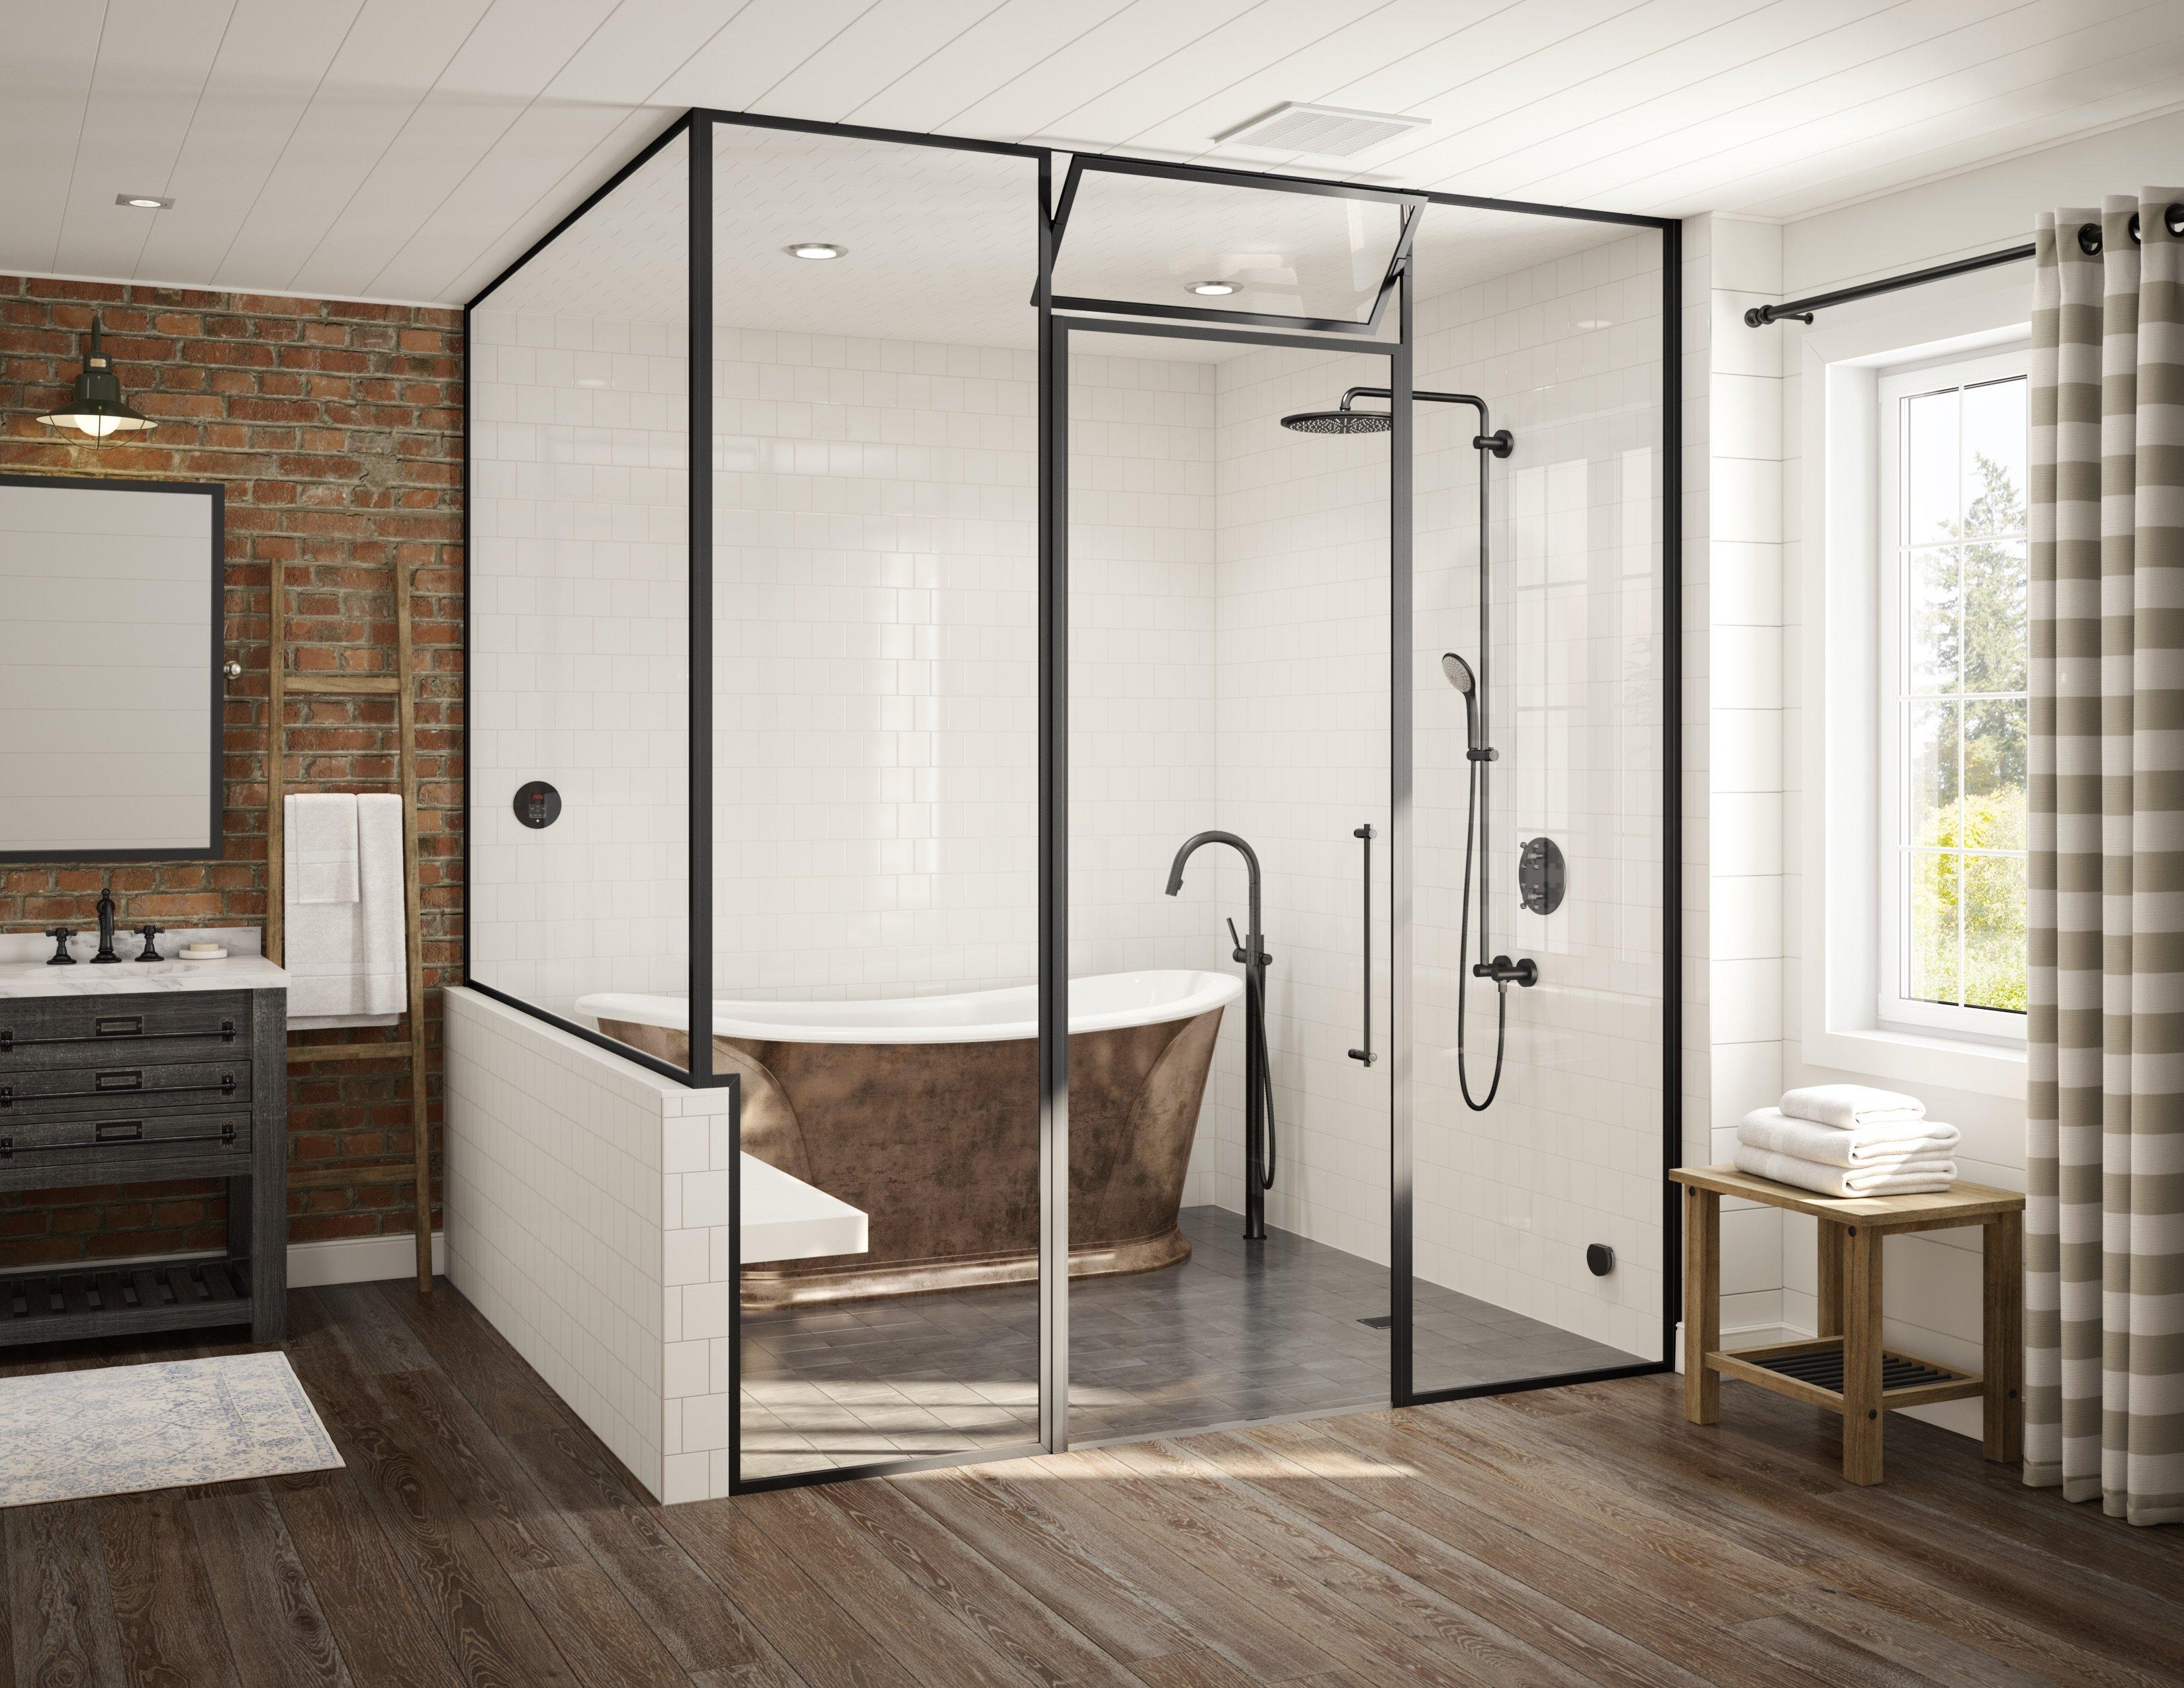 mst2019-05_bathrooms_rustic_final_v1_01